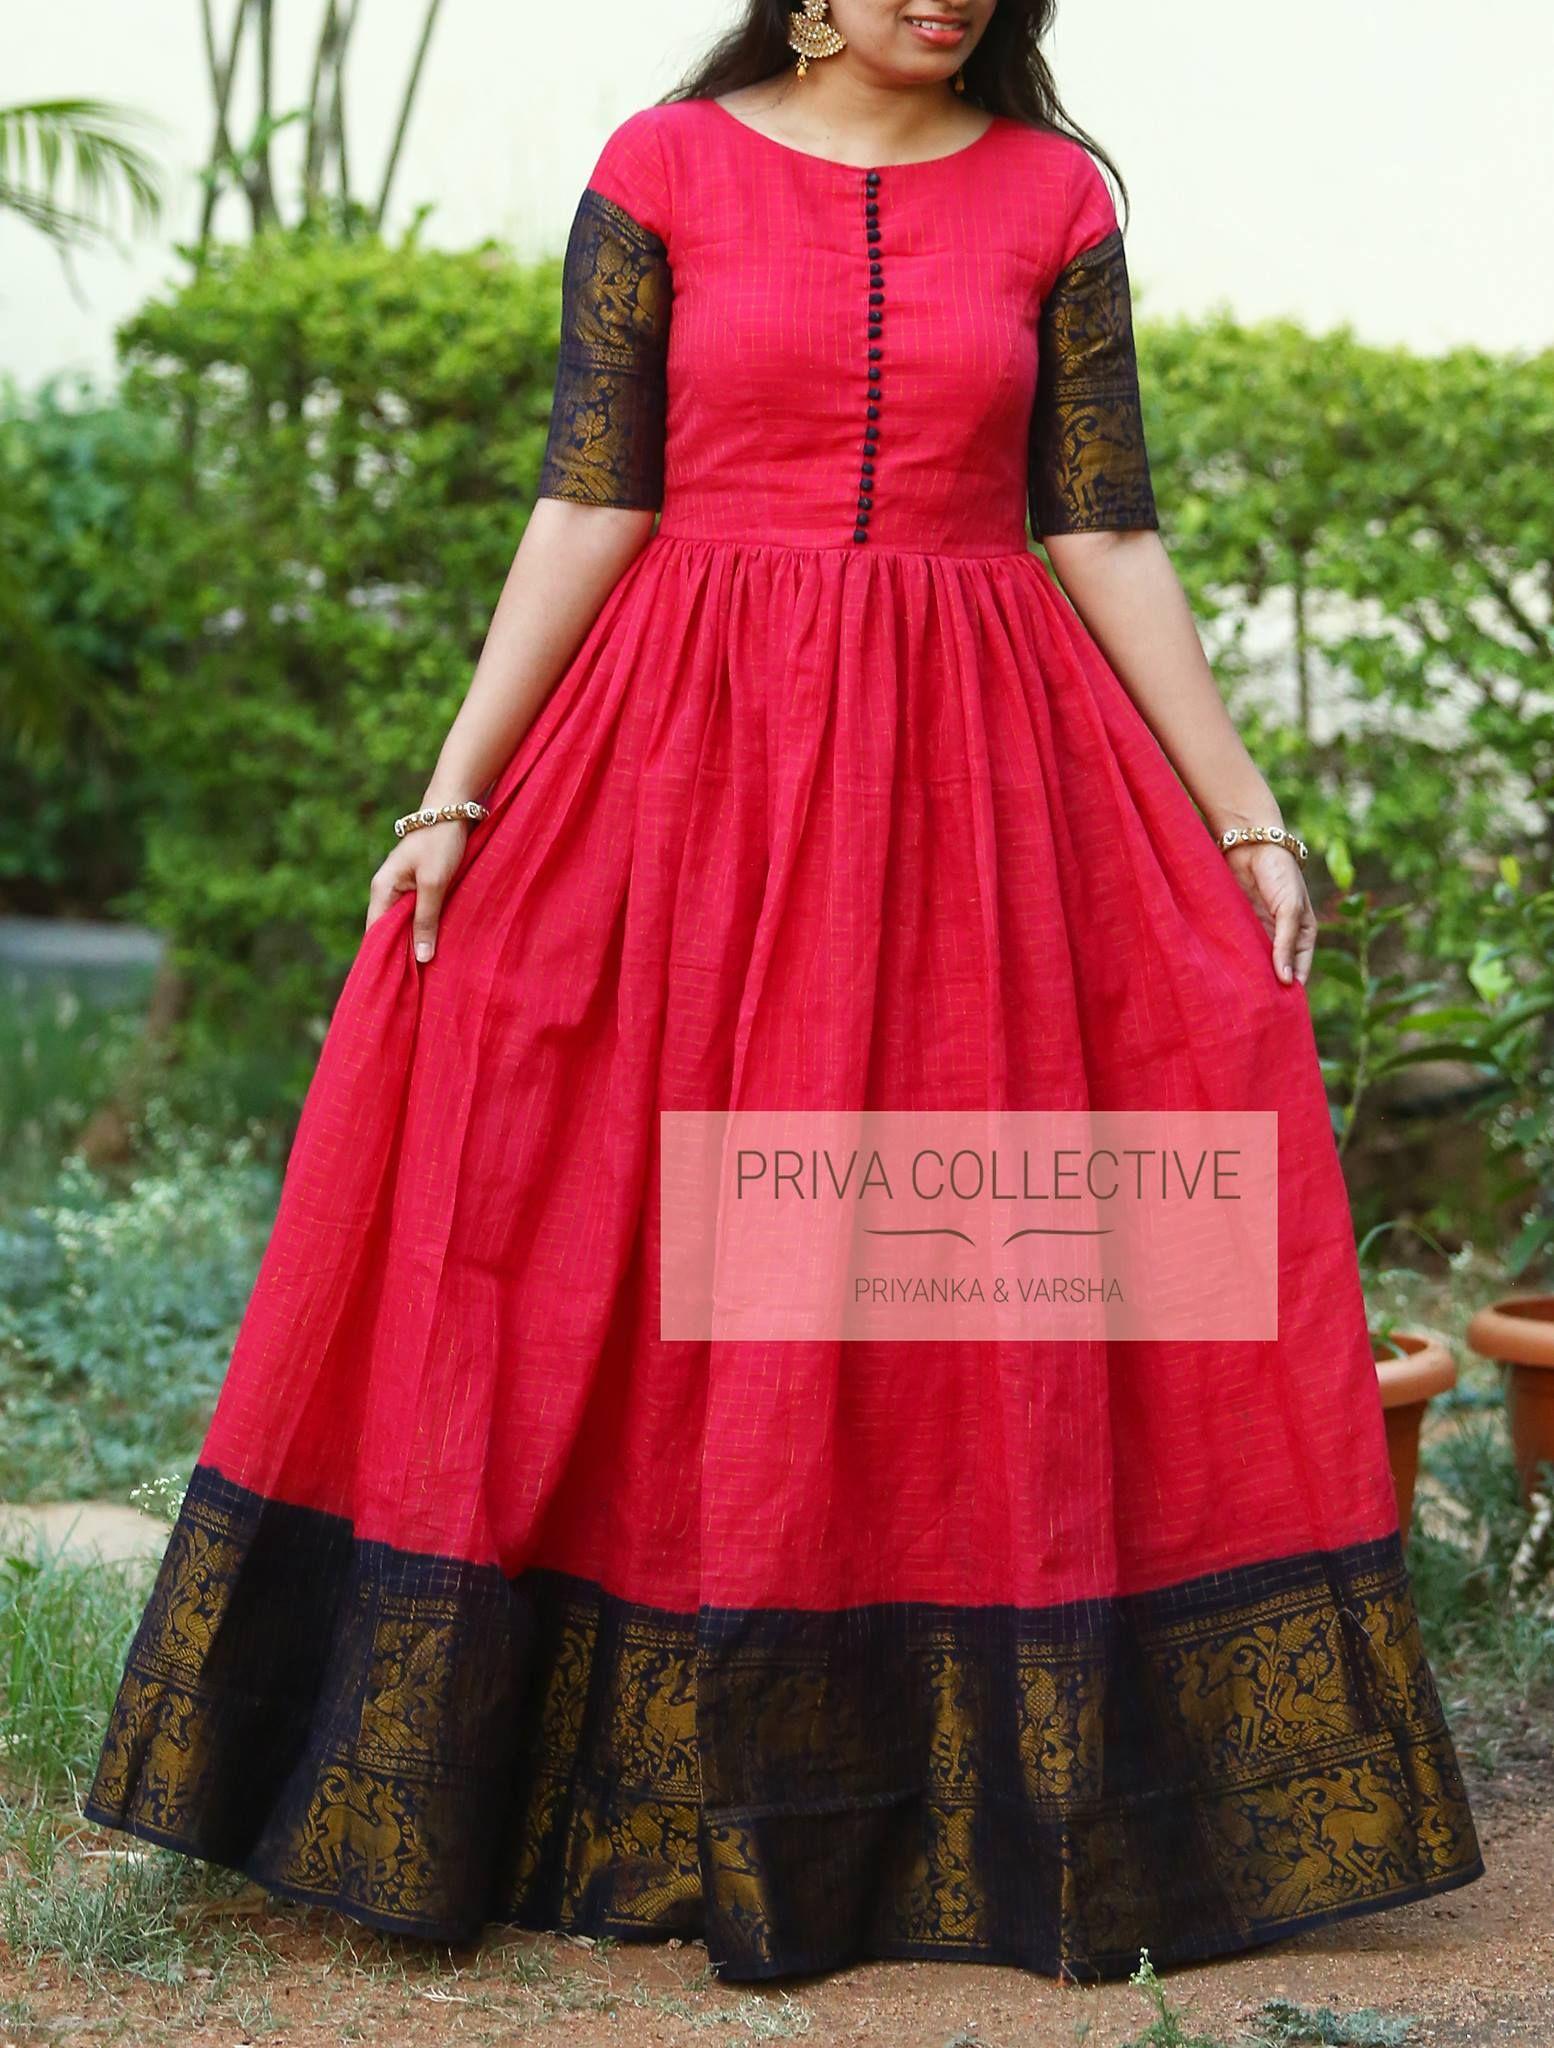 Pin By Neelima Gorripati On Long Dresses Indian Gowns Dresses Designer Dresses Indian Indian Gowns